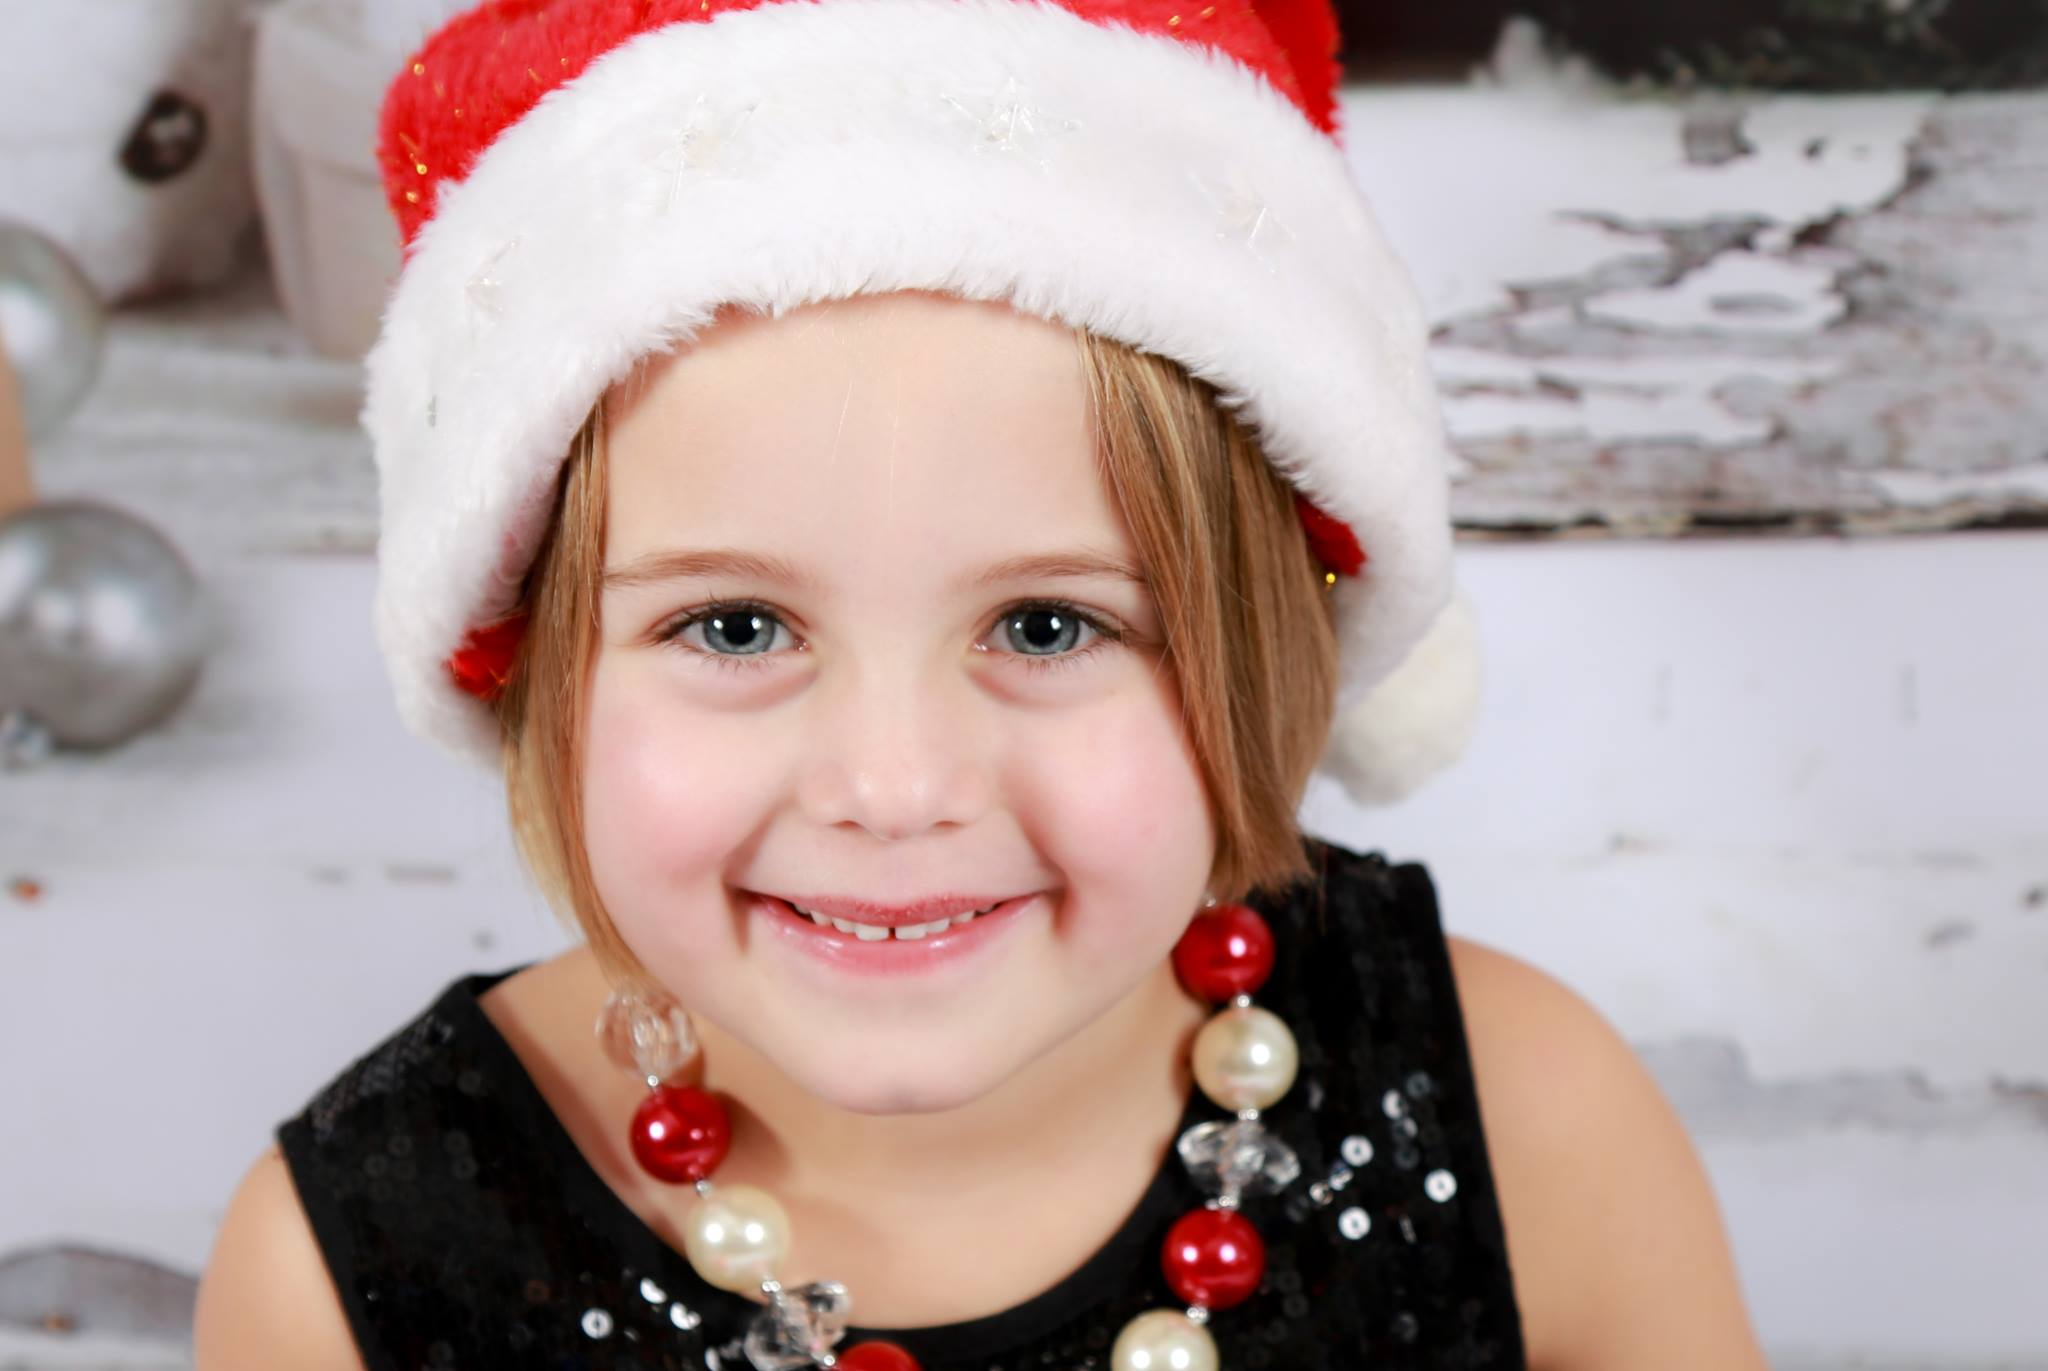 Enfant - florynne photographie